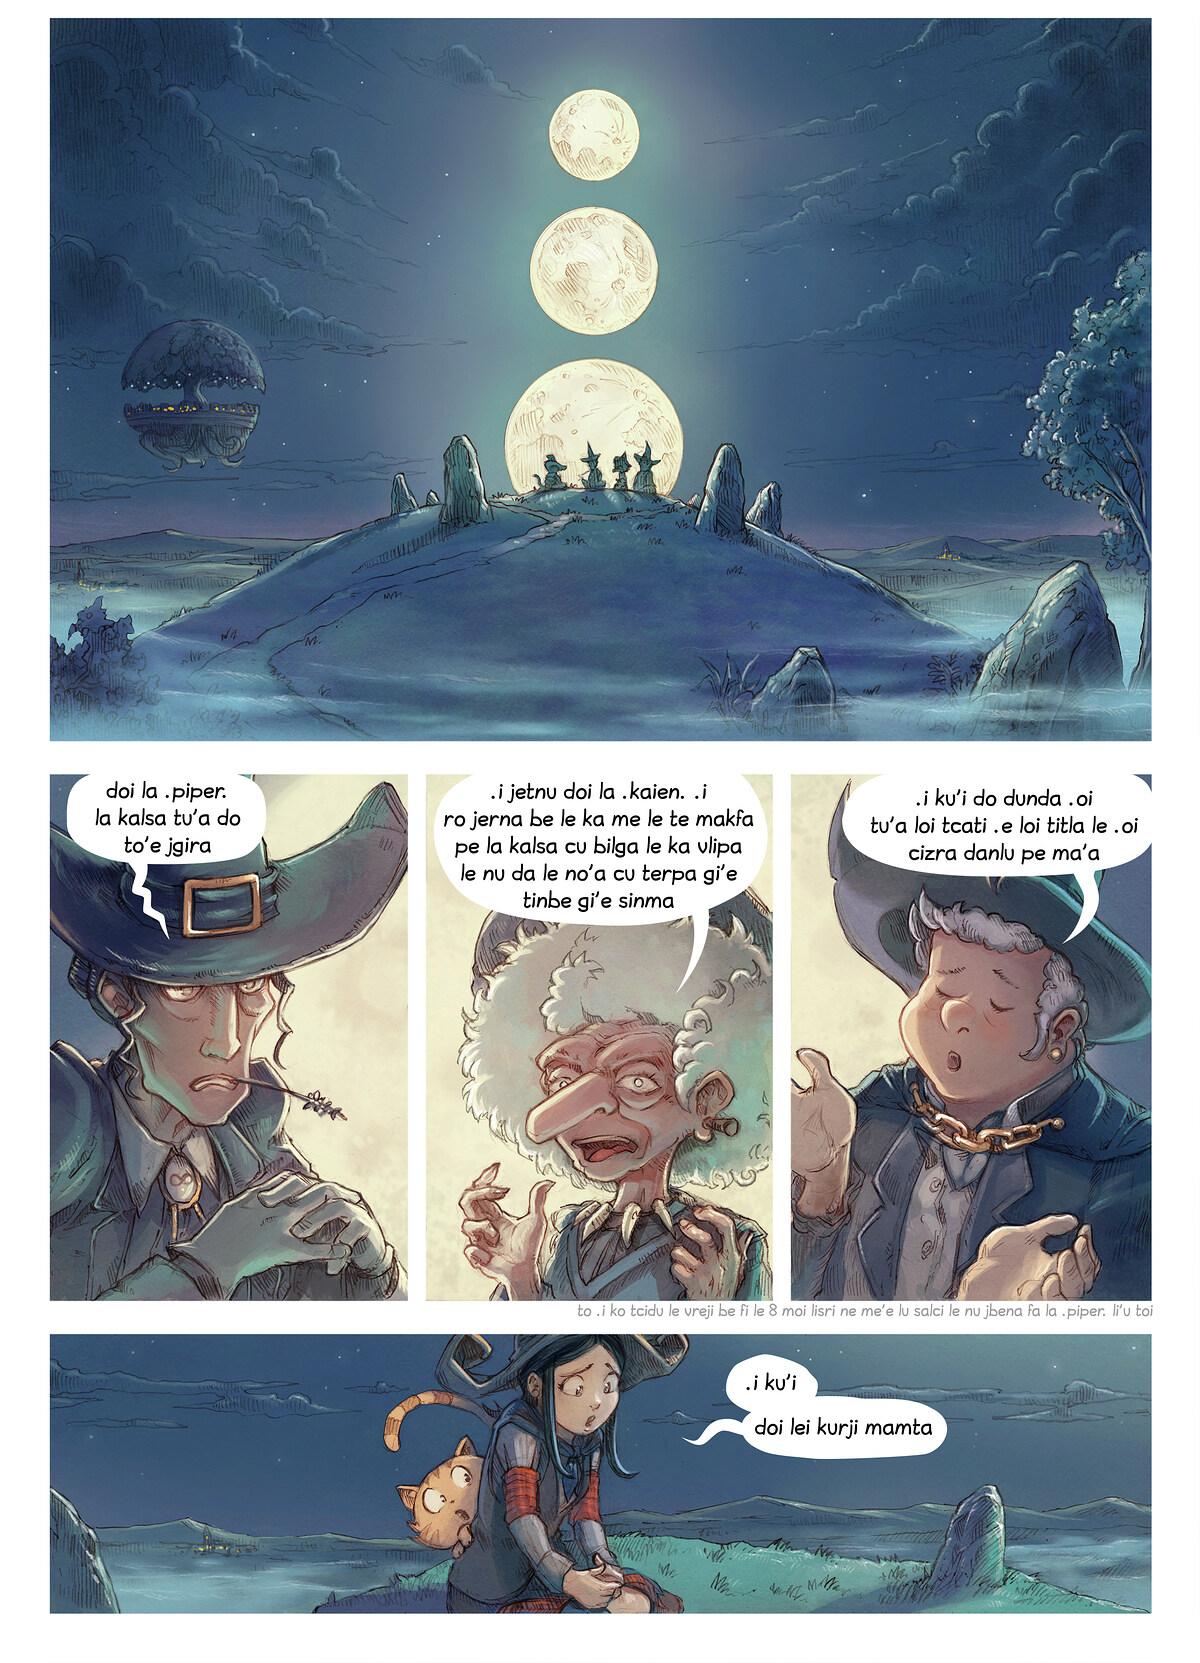 i 11 mo'o lisri le te makfa pe la kalsa, Page 1